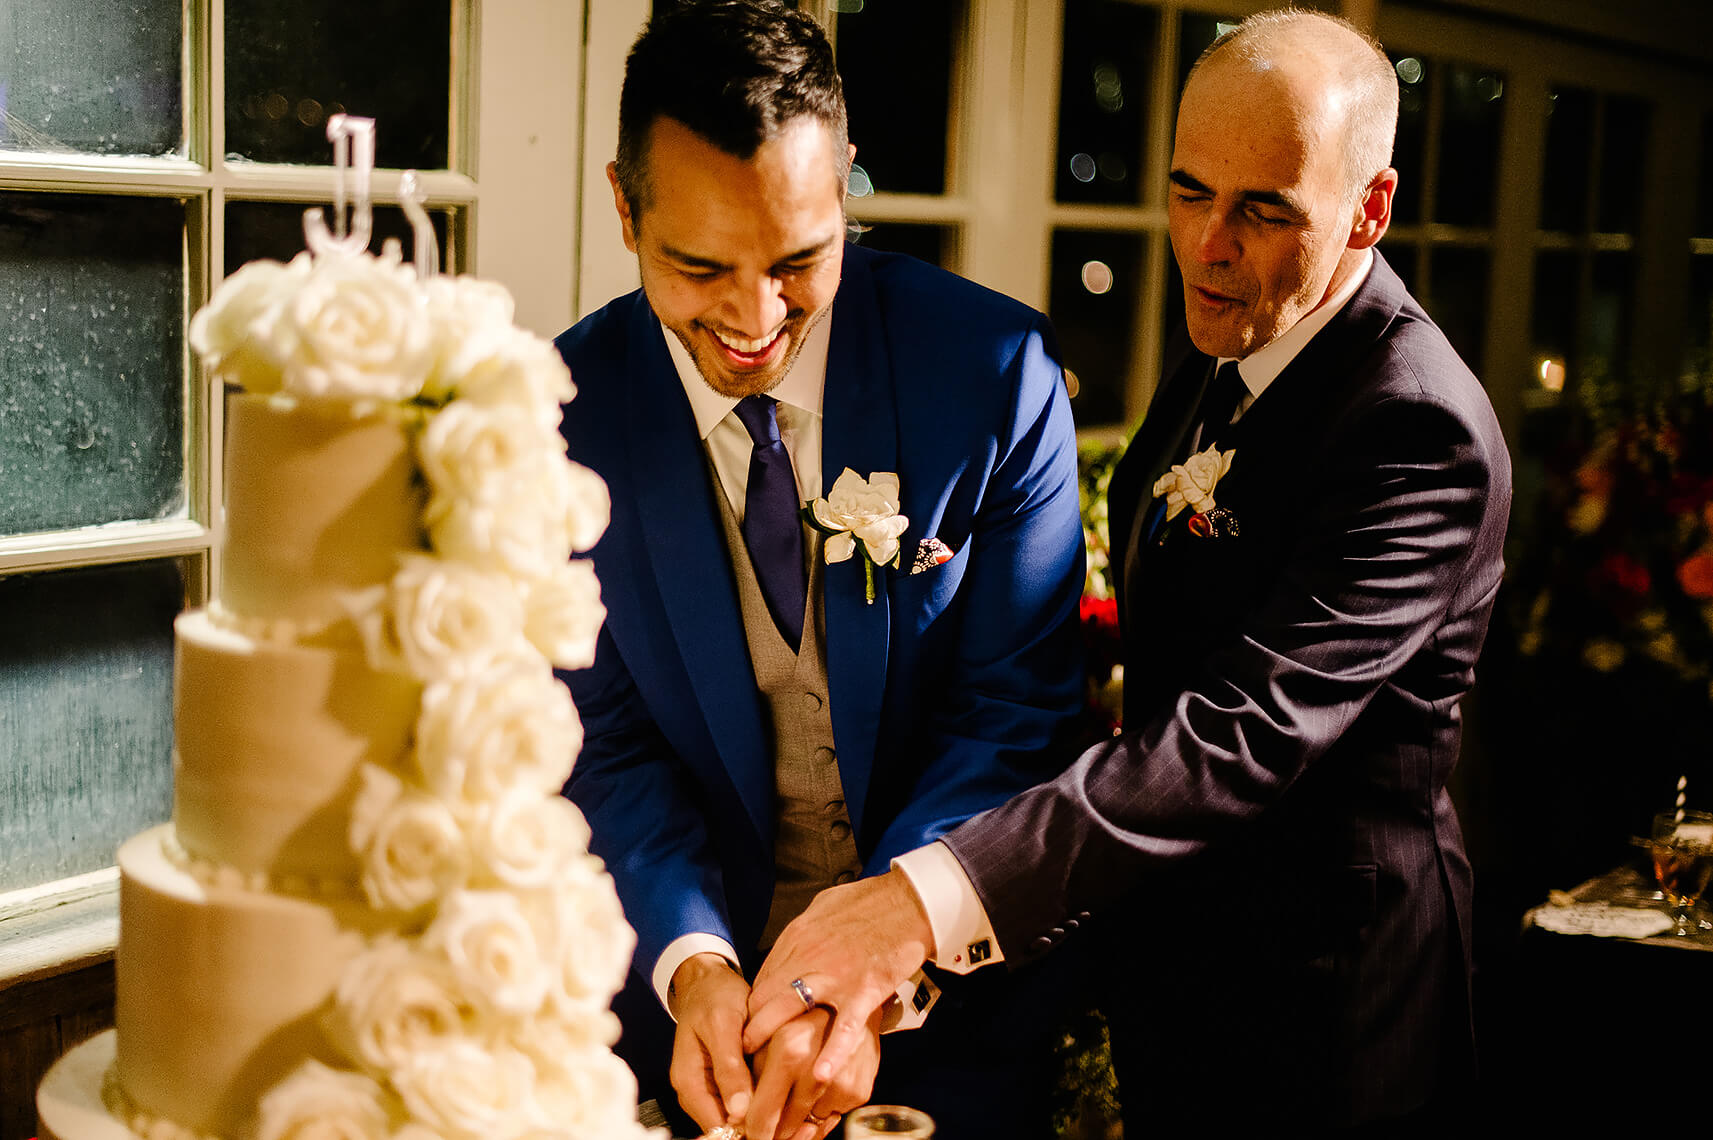 malibu-calamigos-ranch-same-sex-wedding-photographer-los-angeles-33.jpg